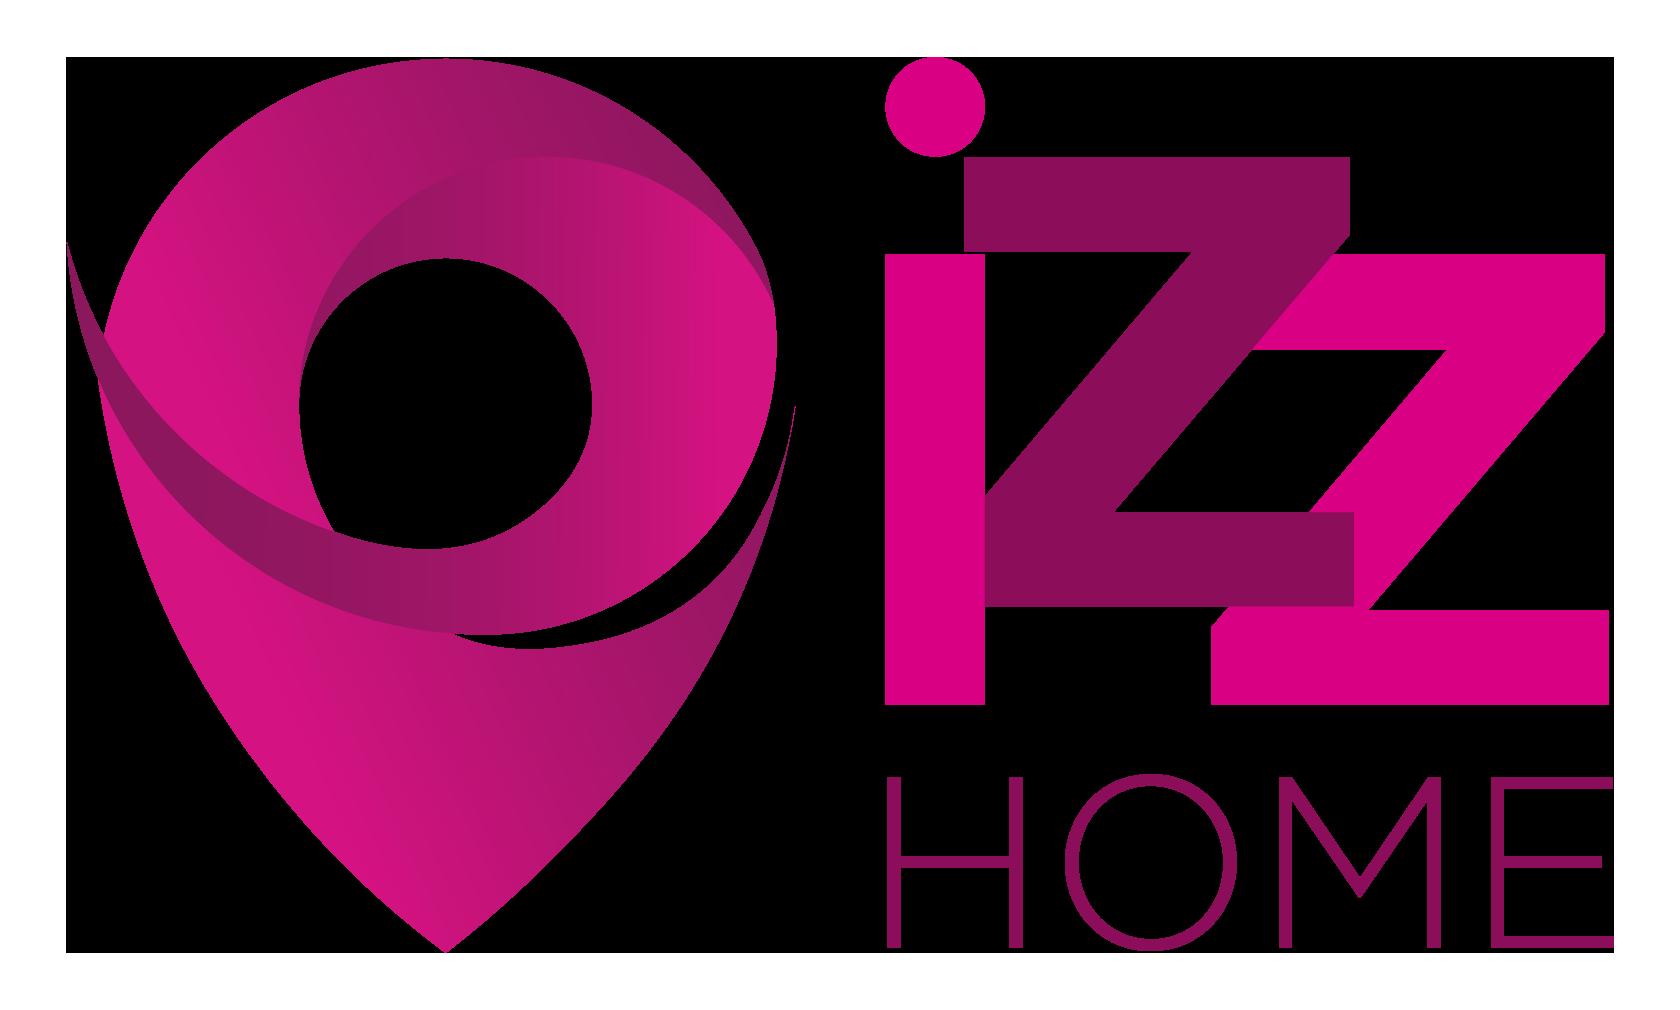 izzhome_logo_sito